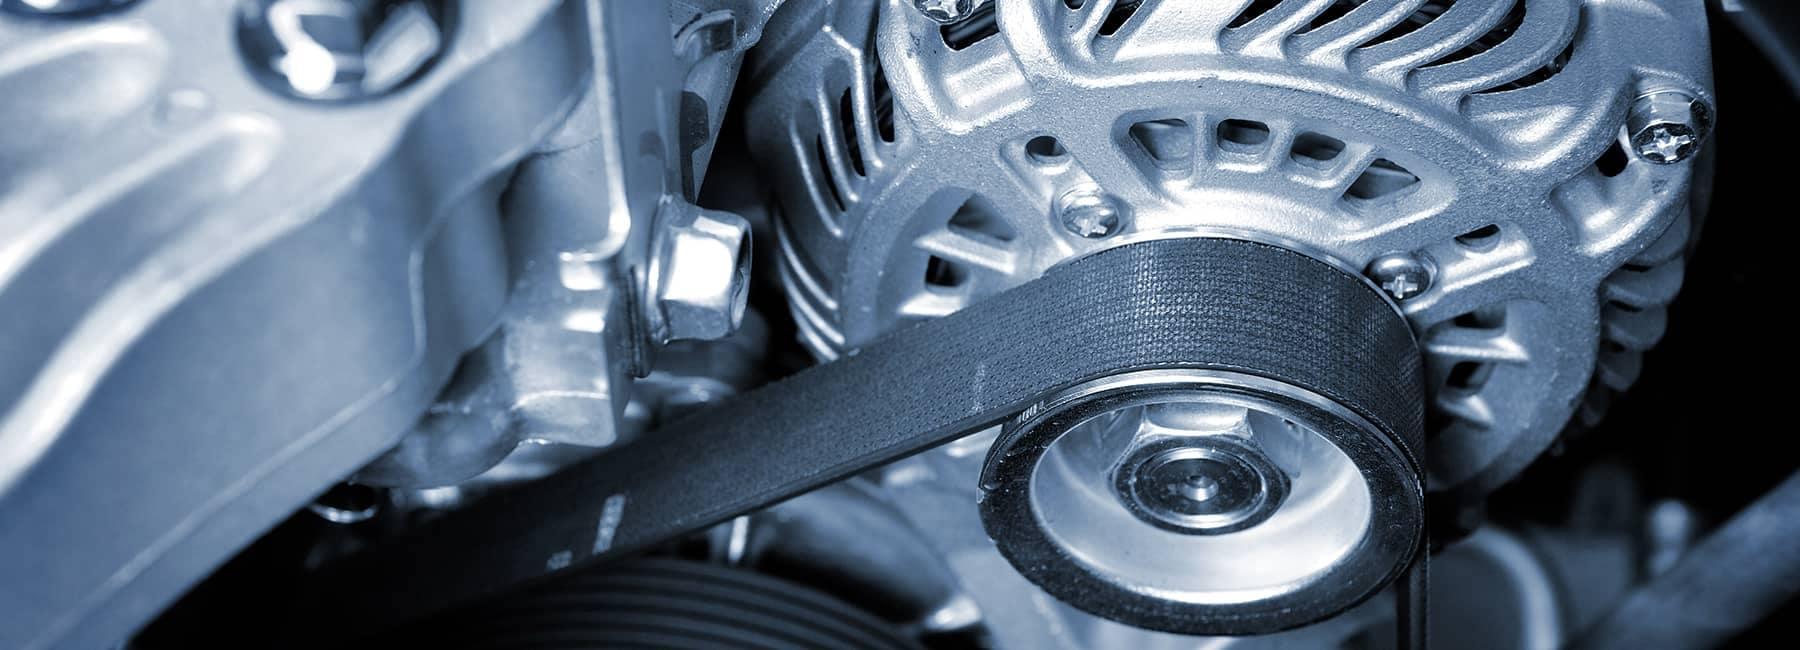 Engine and belt